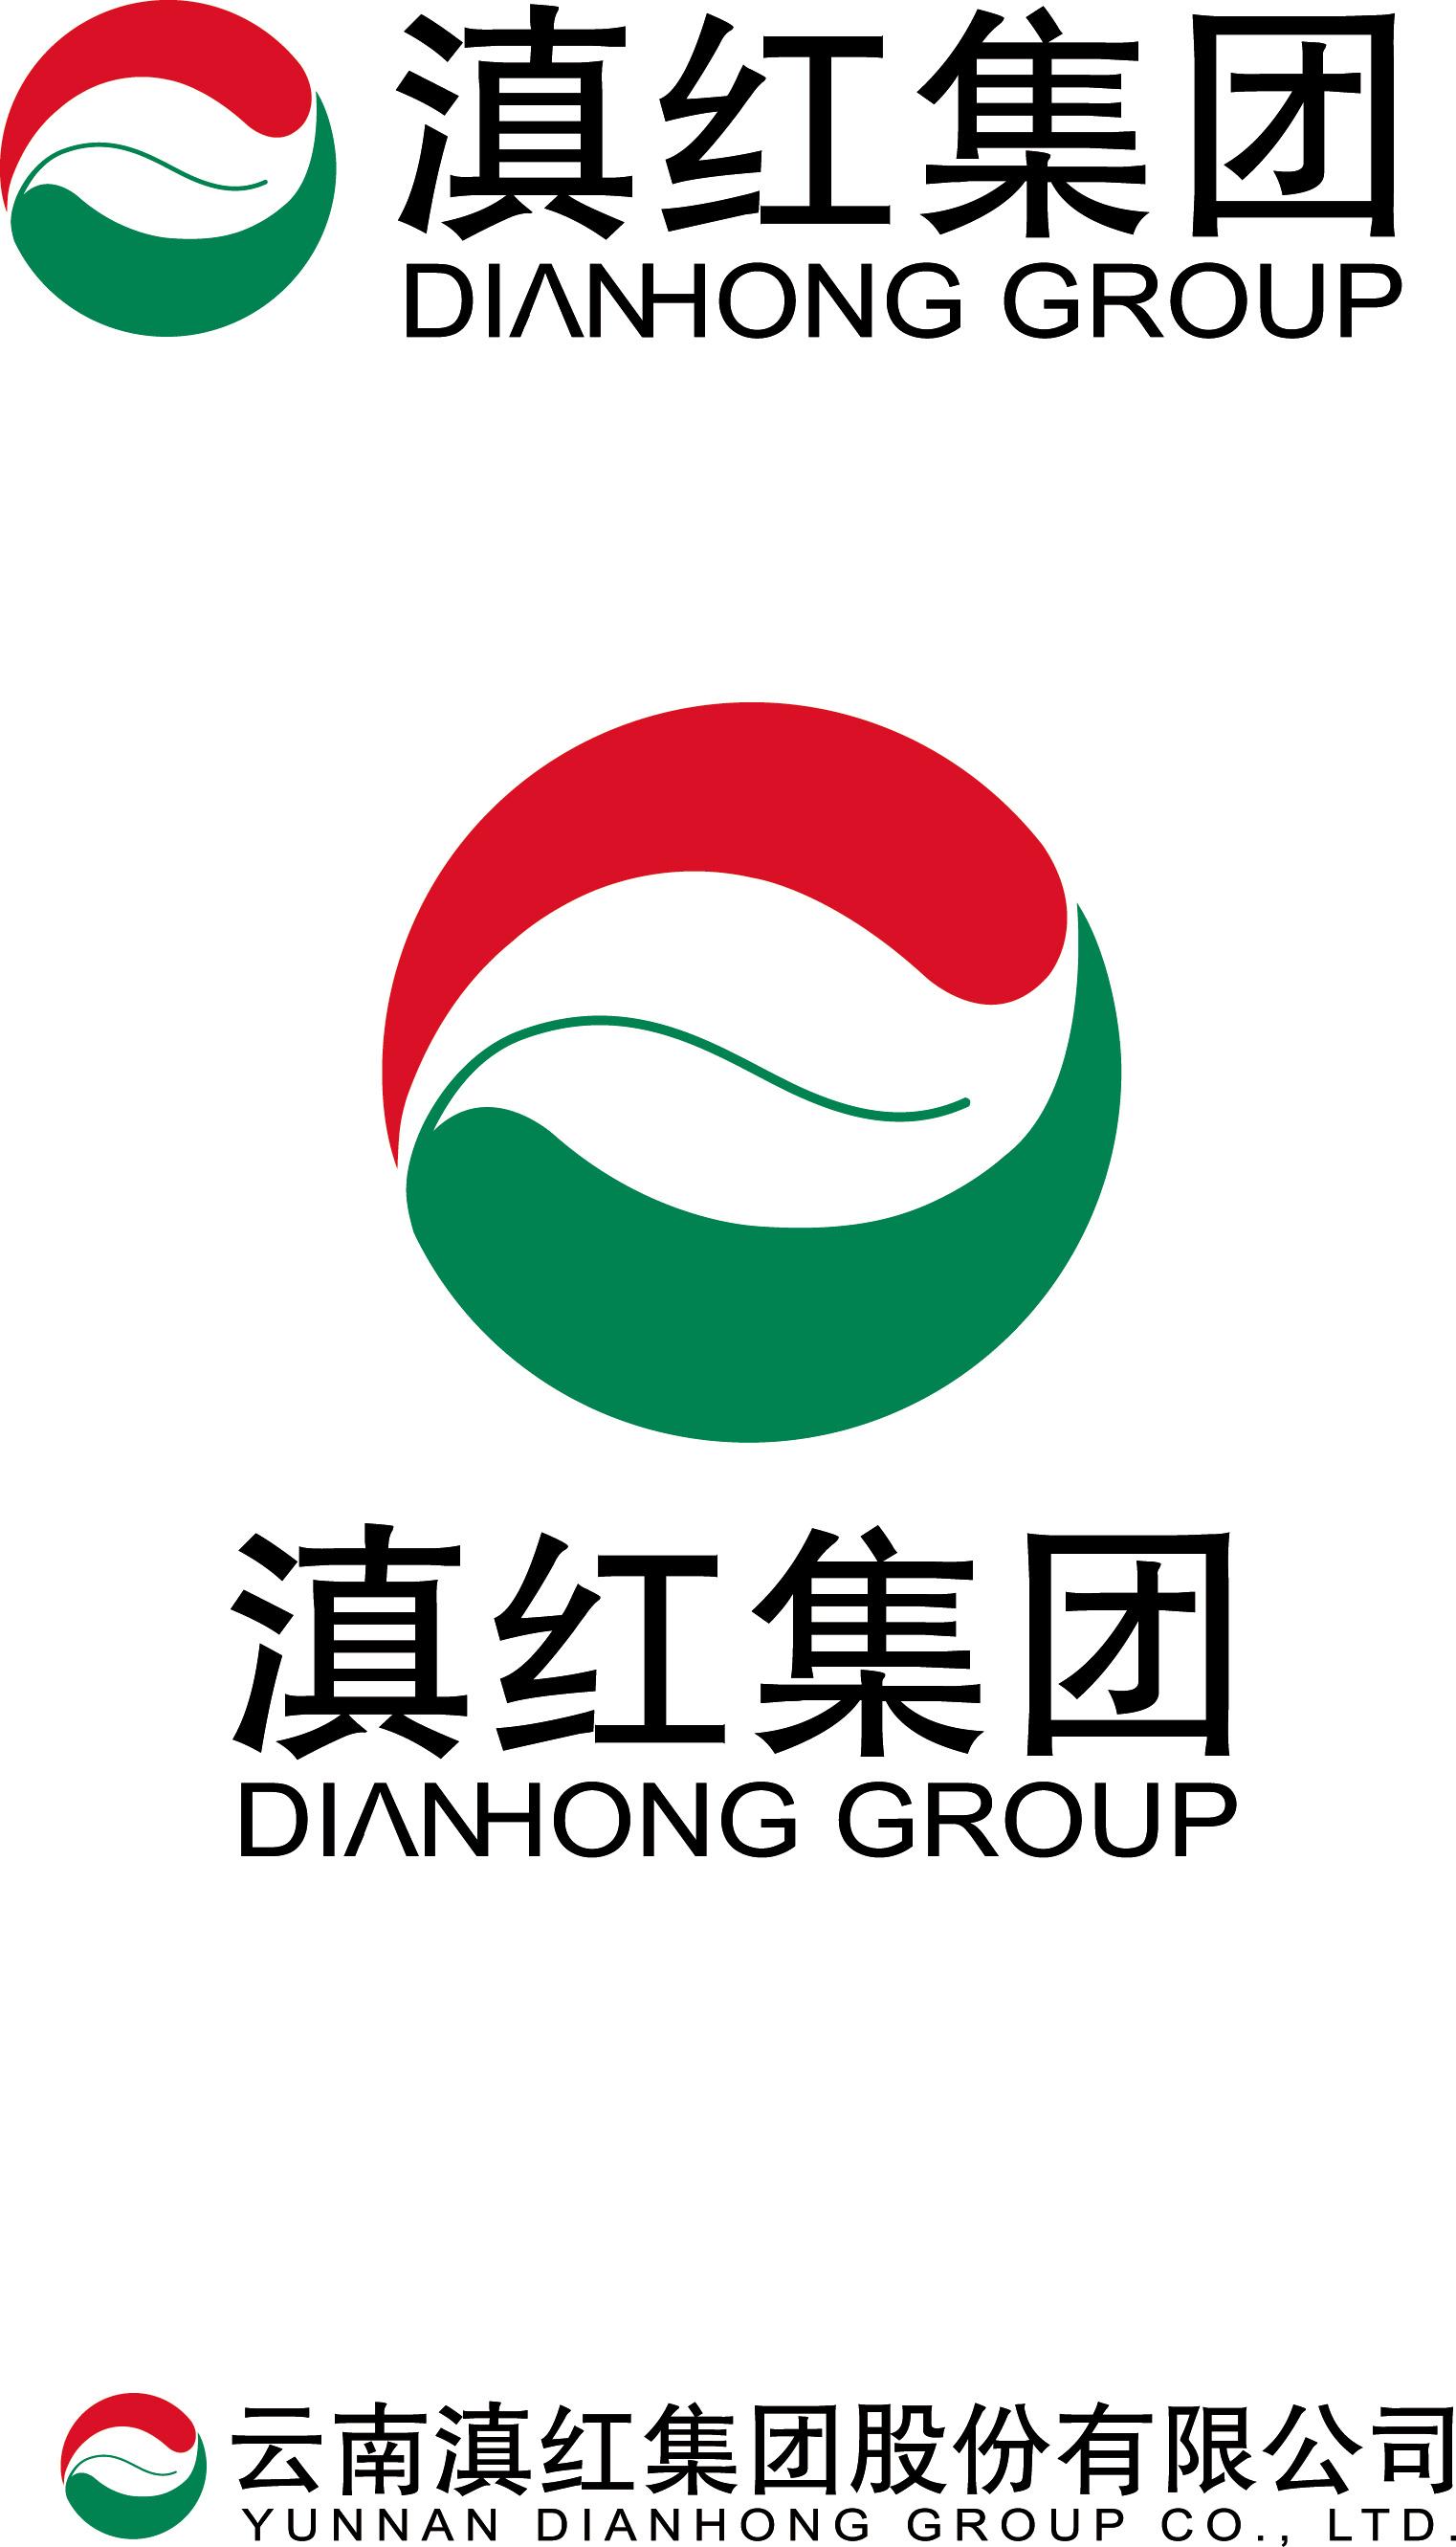 DIANHONG GRUOP